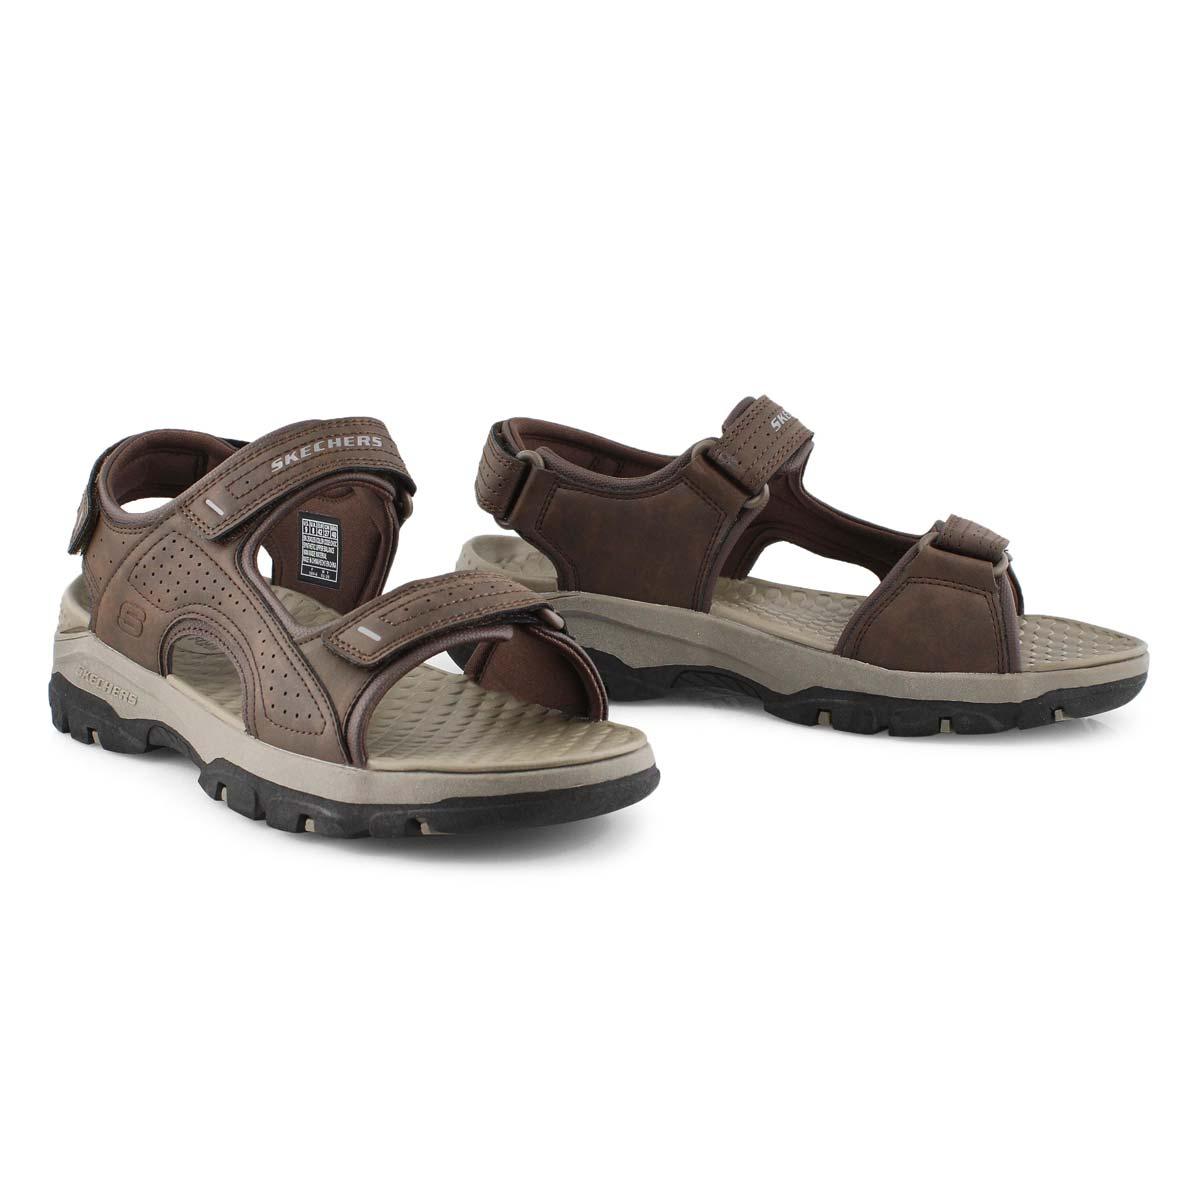 Mns Tresmen Garo chocolate sport sandal